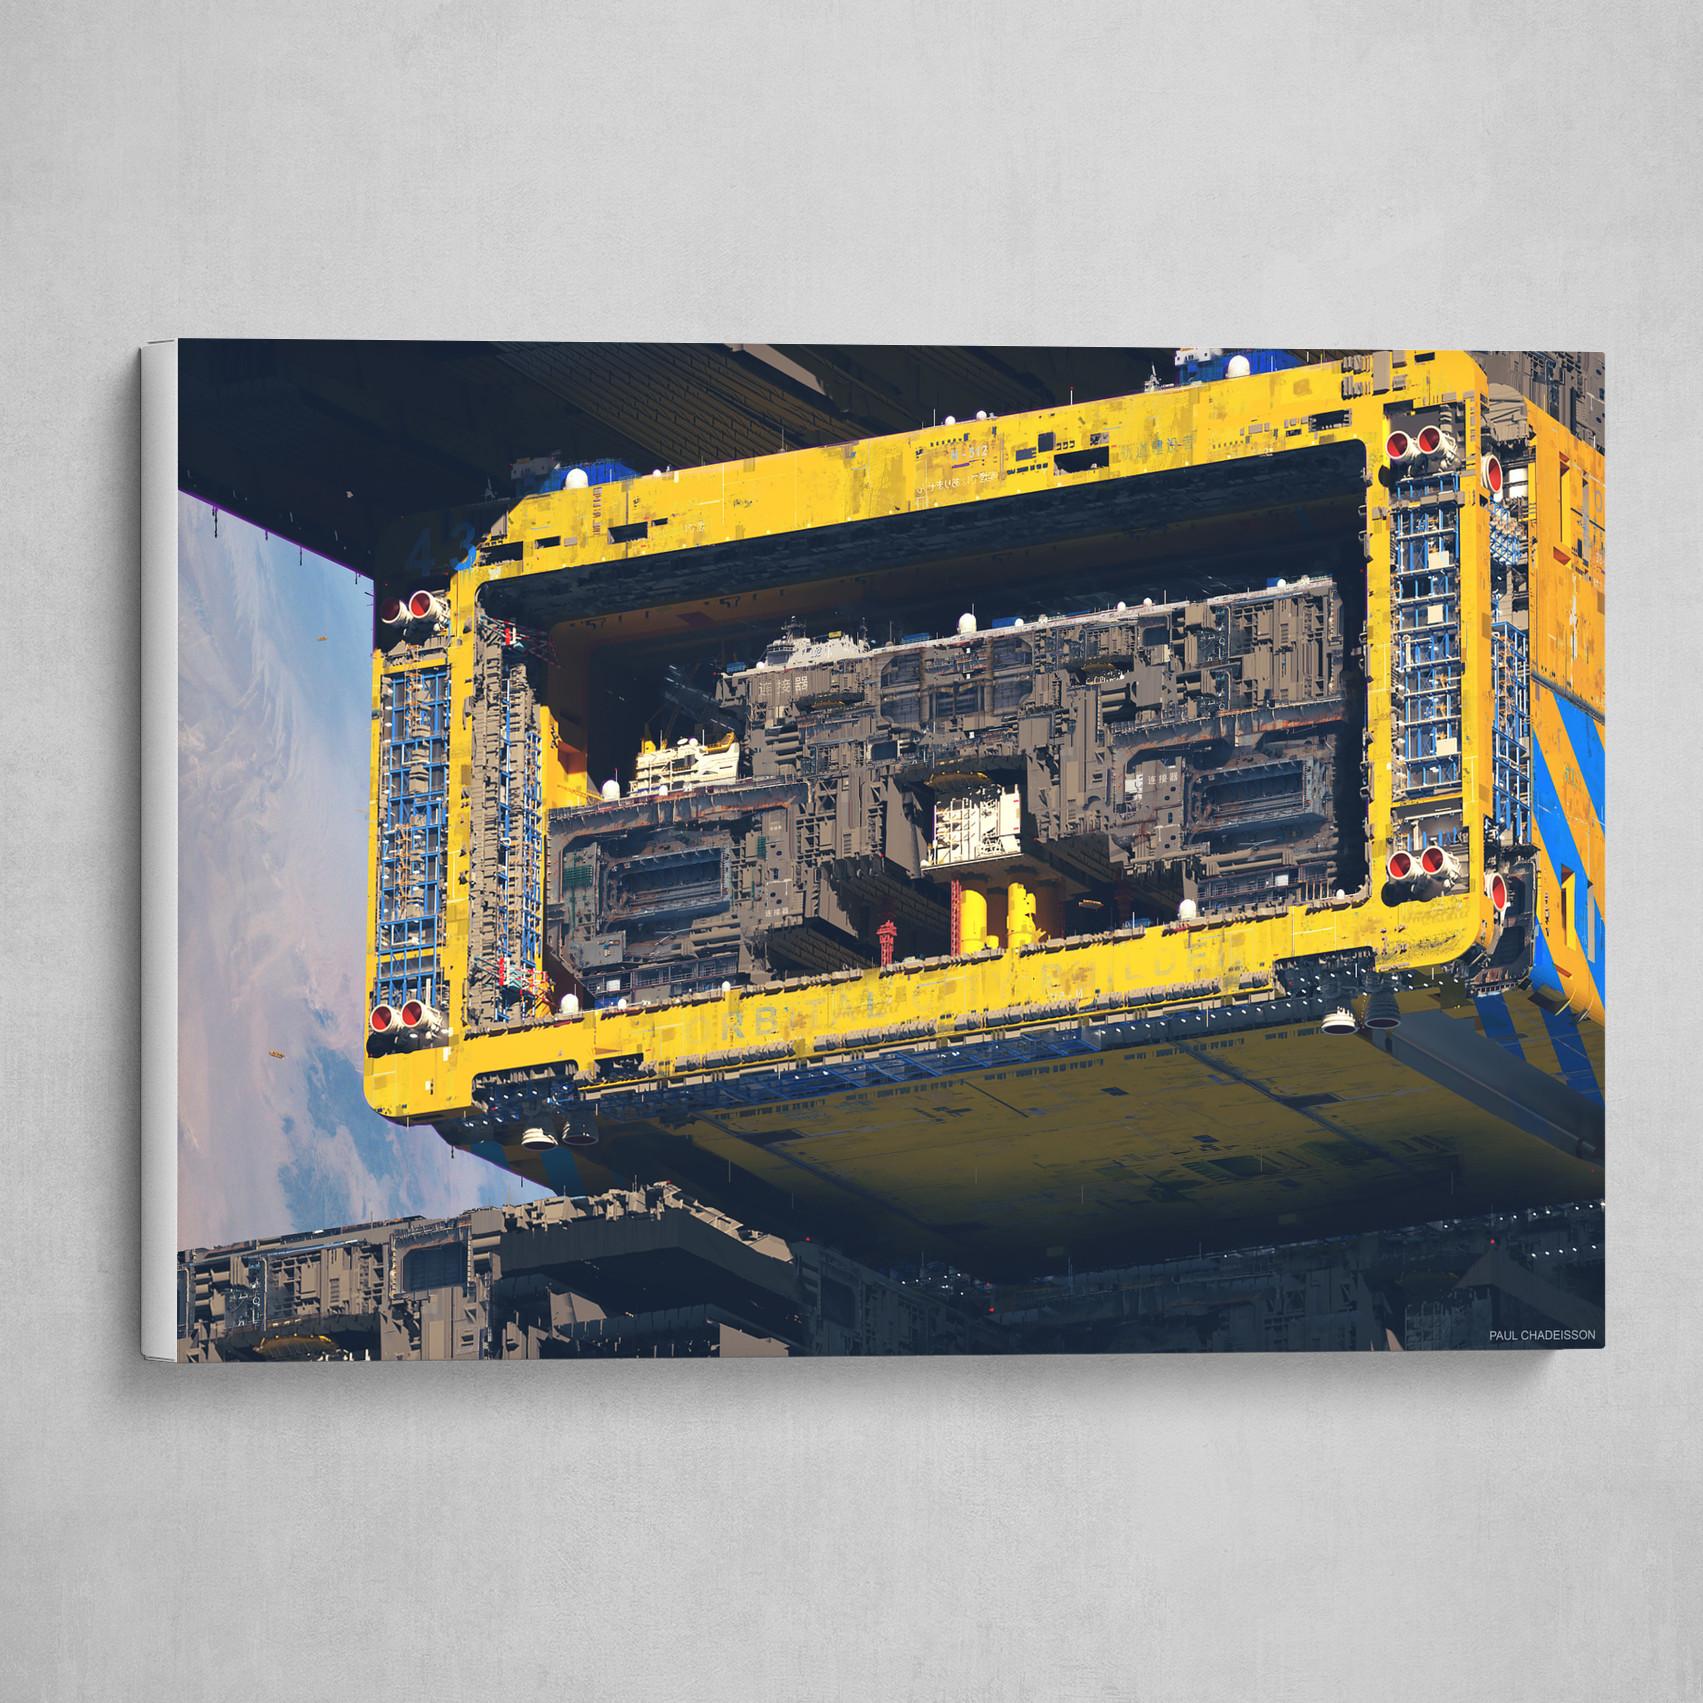 OFF WORLD | Orbital city builder